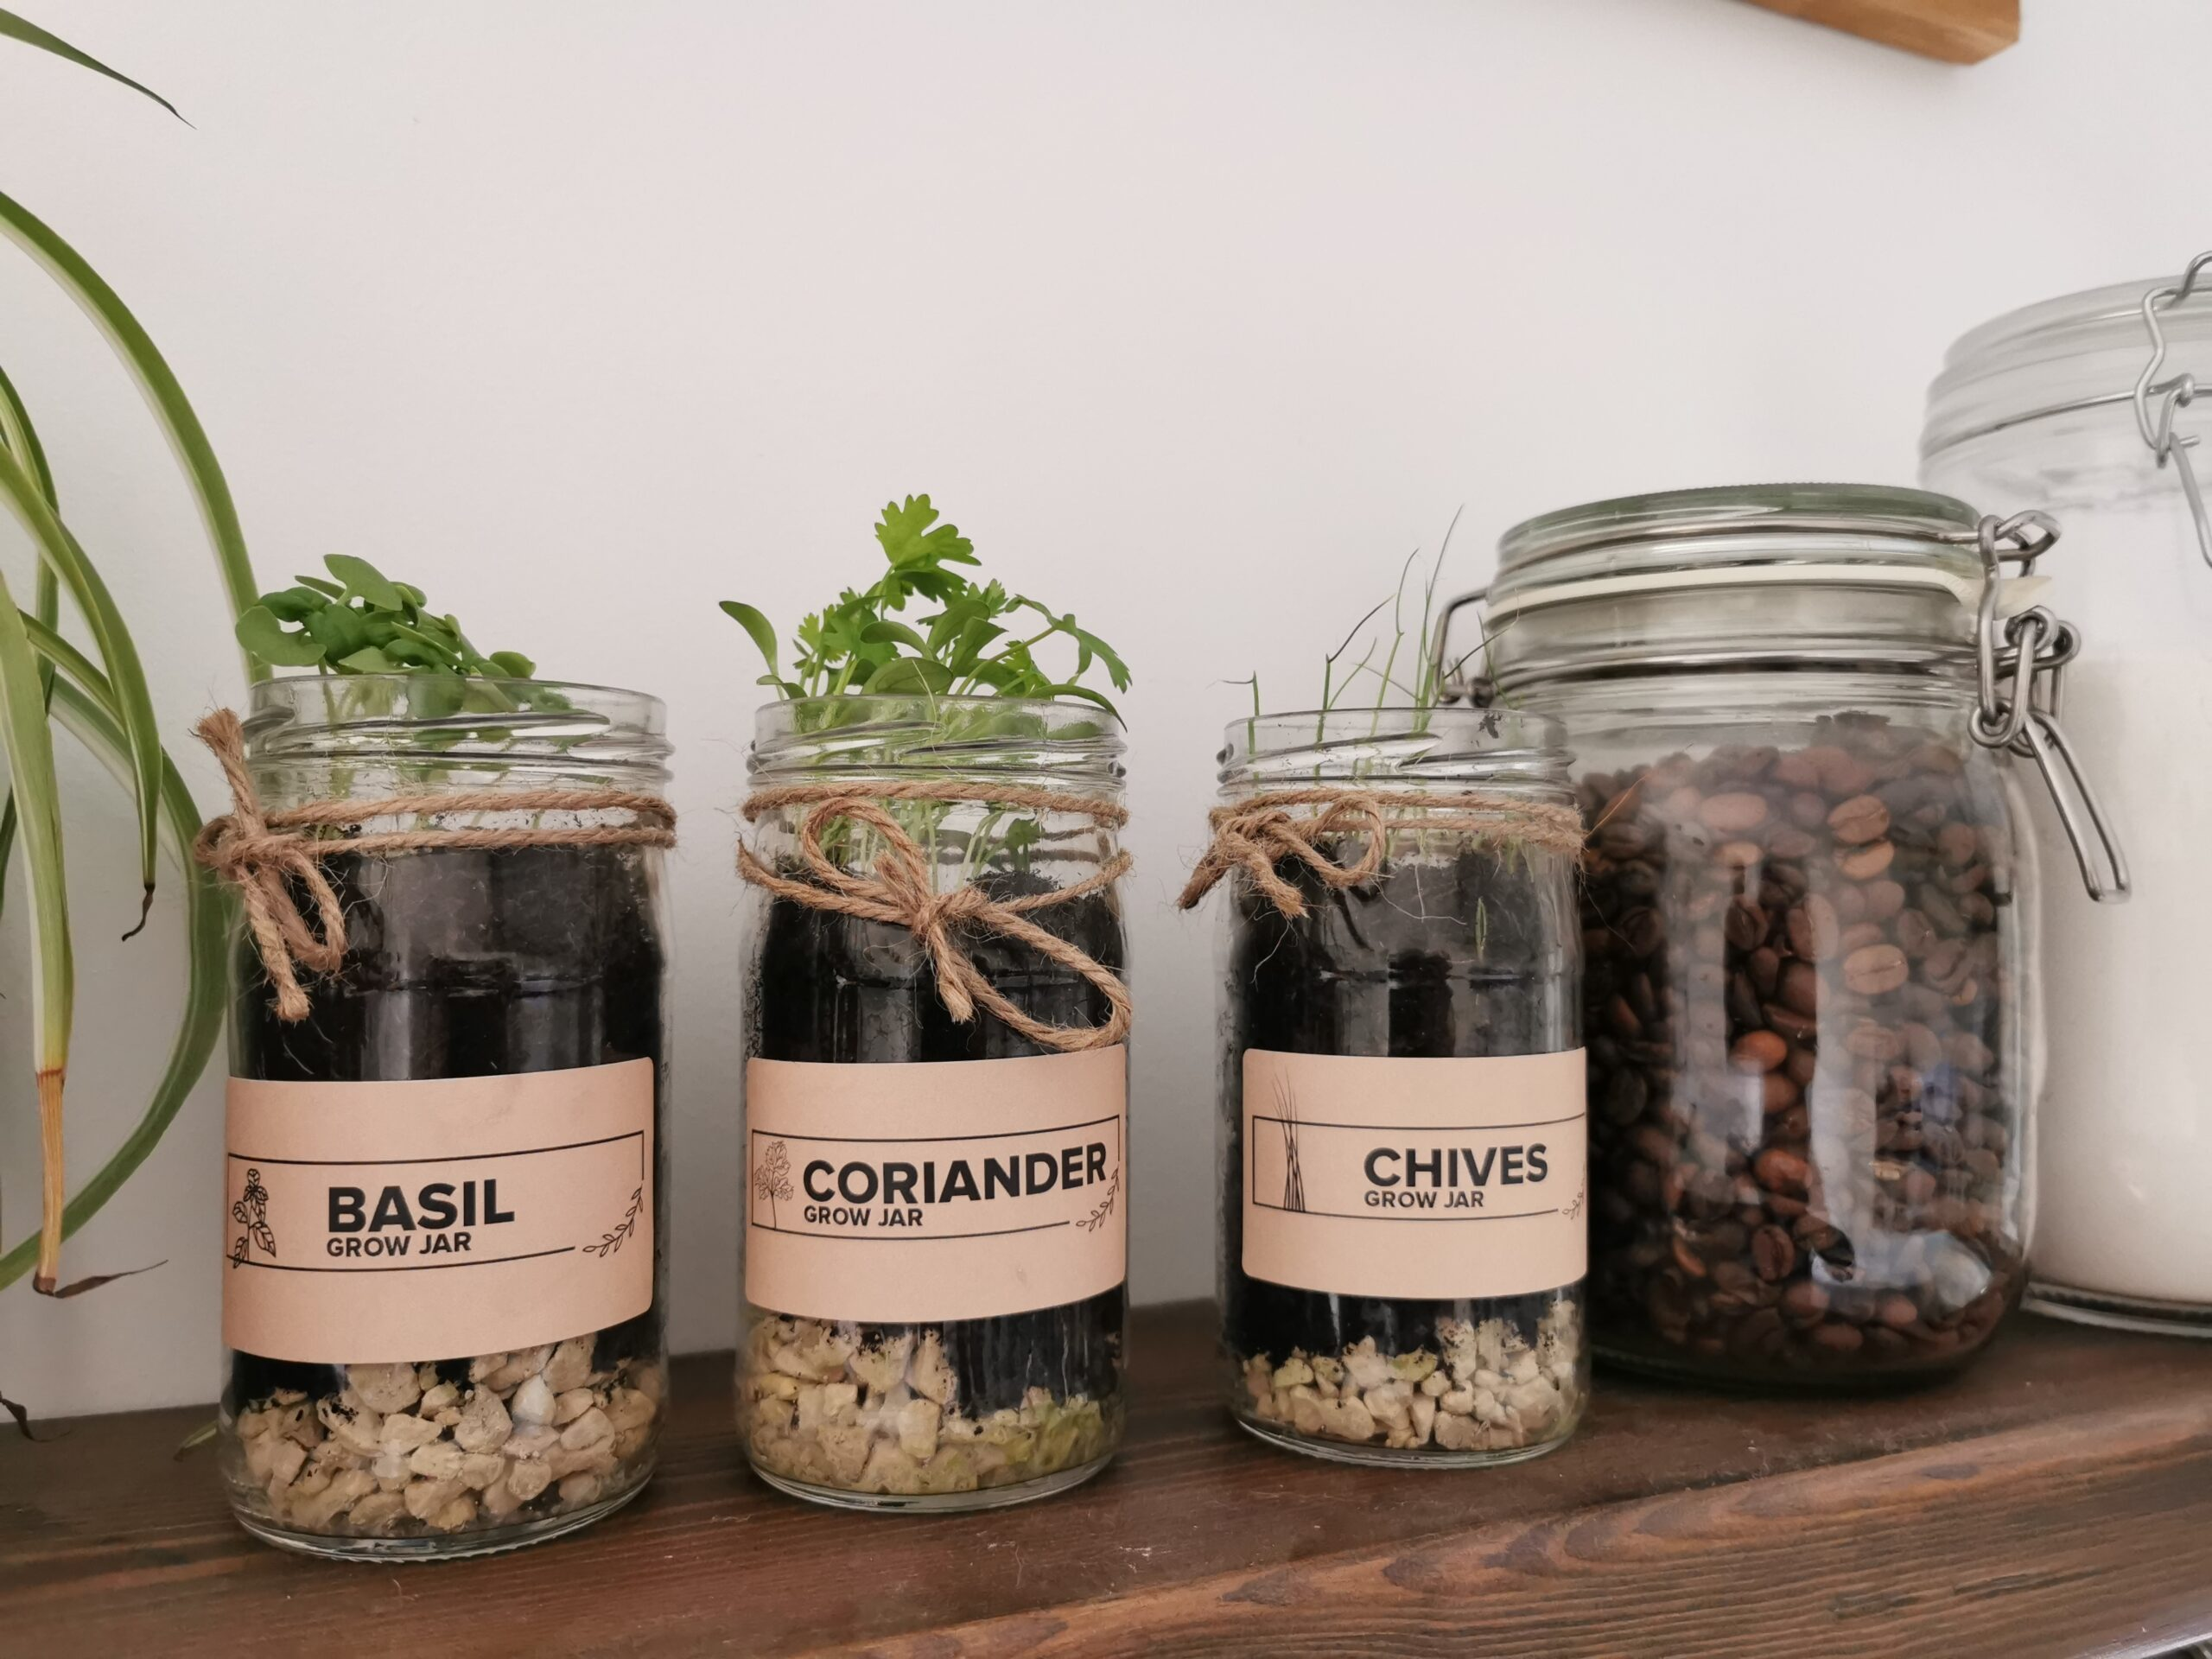 eco friendly gift - herb garden